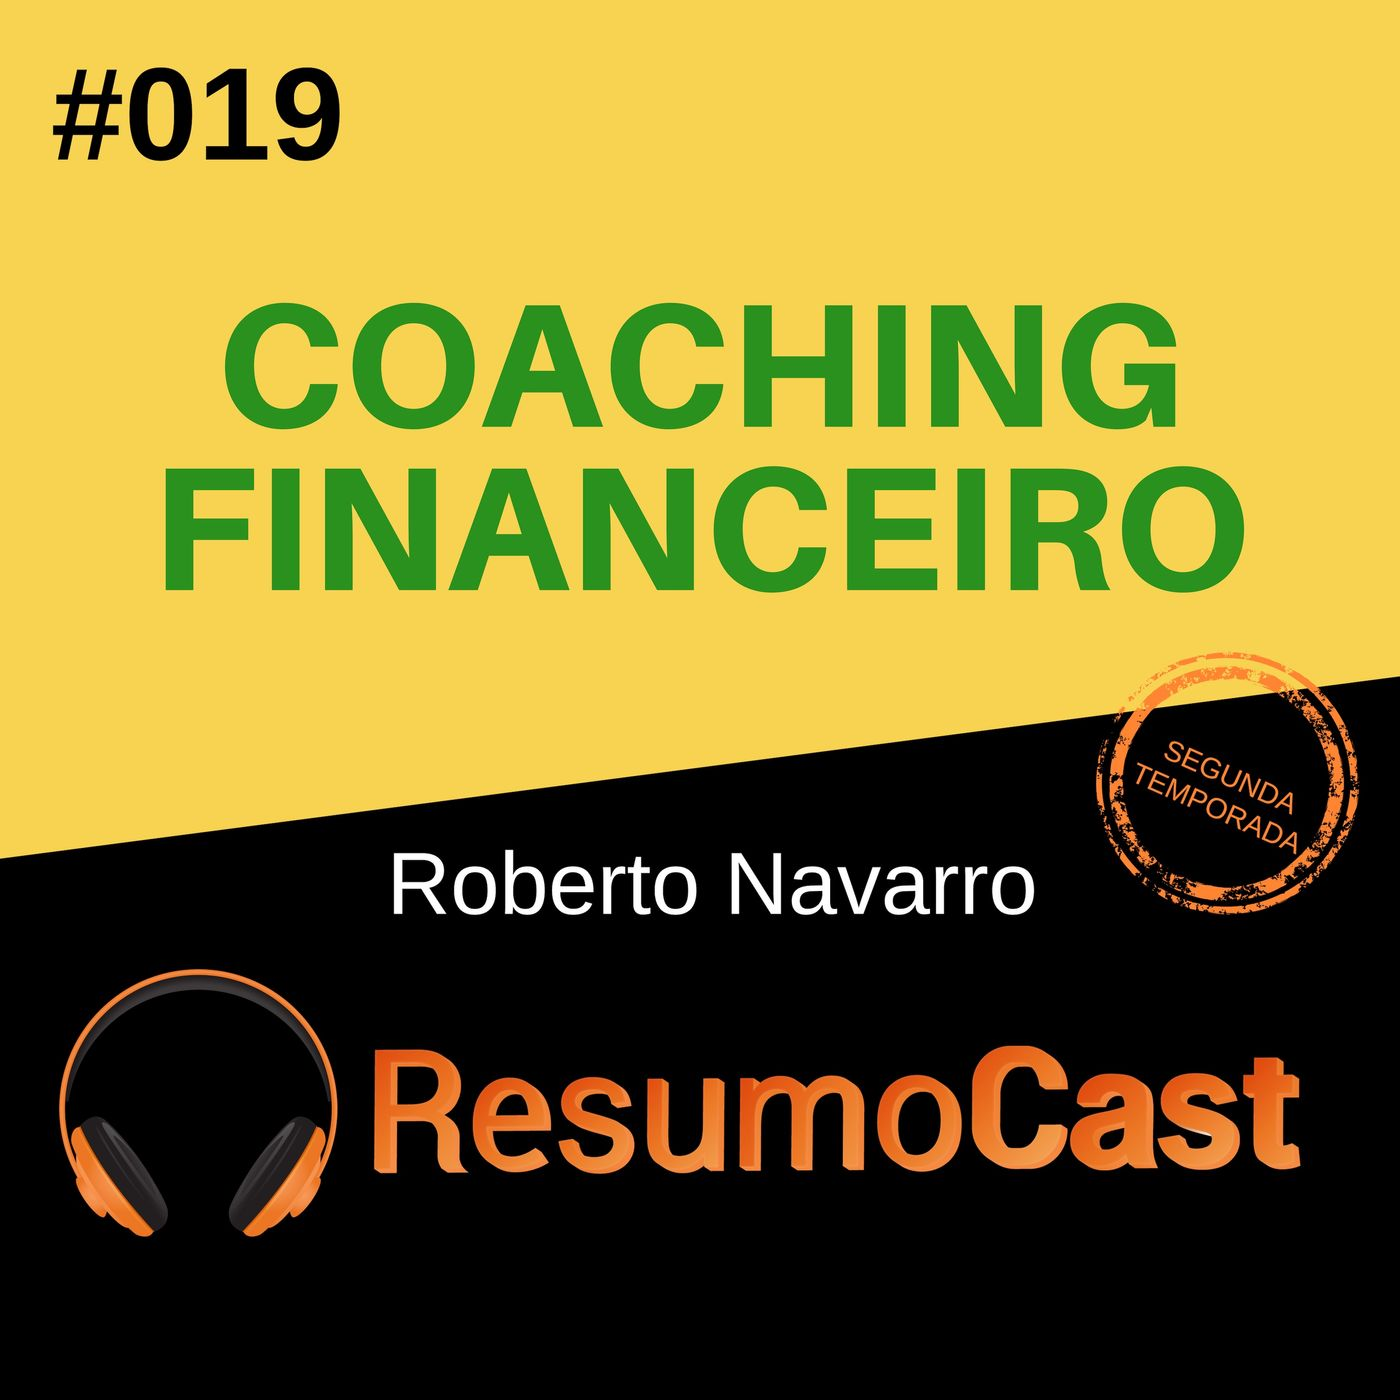 T2#019 Coach financeiro | Roberto Navarro